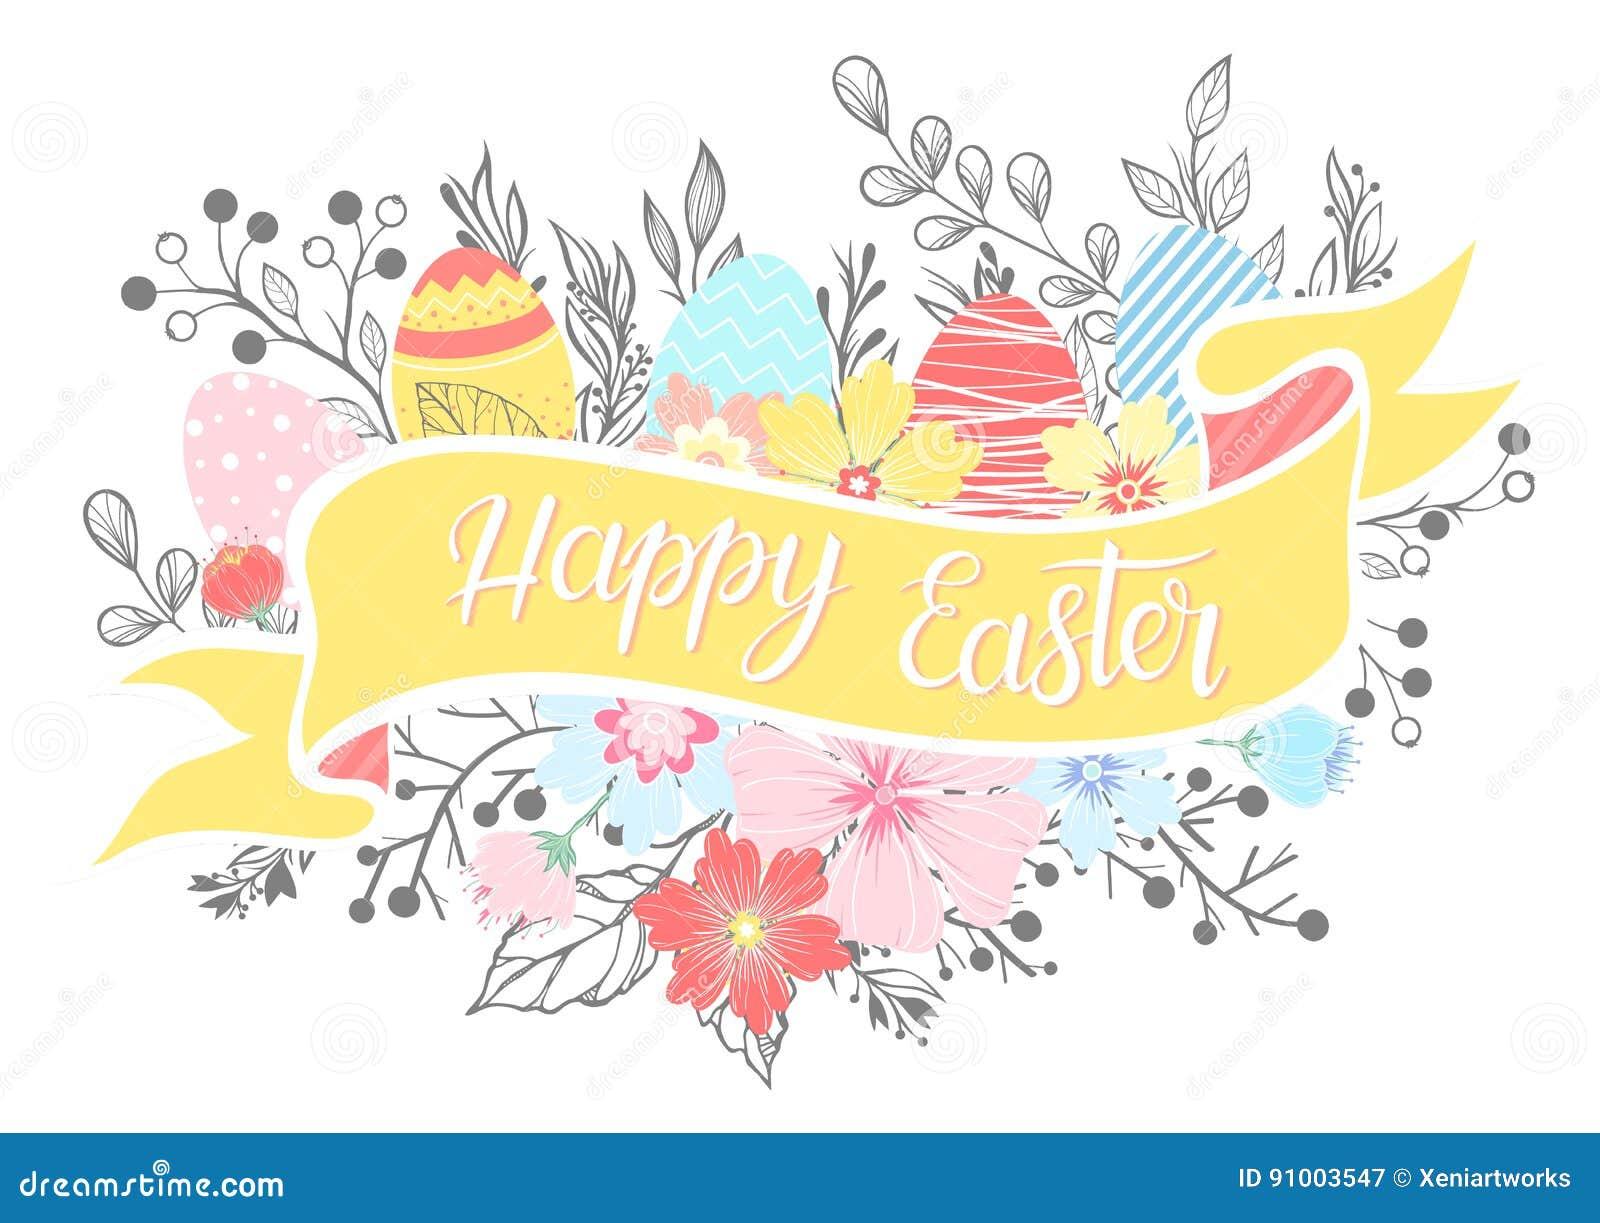 Easter seasons greetings card stock vector illustration of download easter seasons greetings card stock vector illustration of abstract catholic 91003547 m4hsunfo